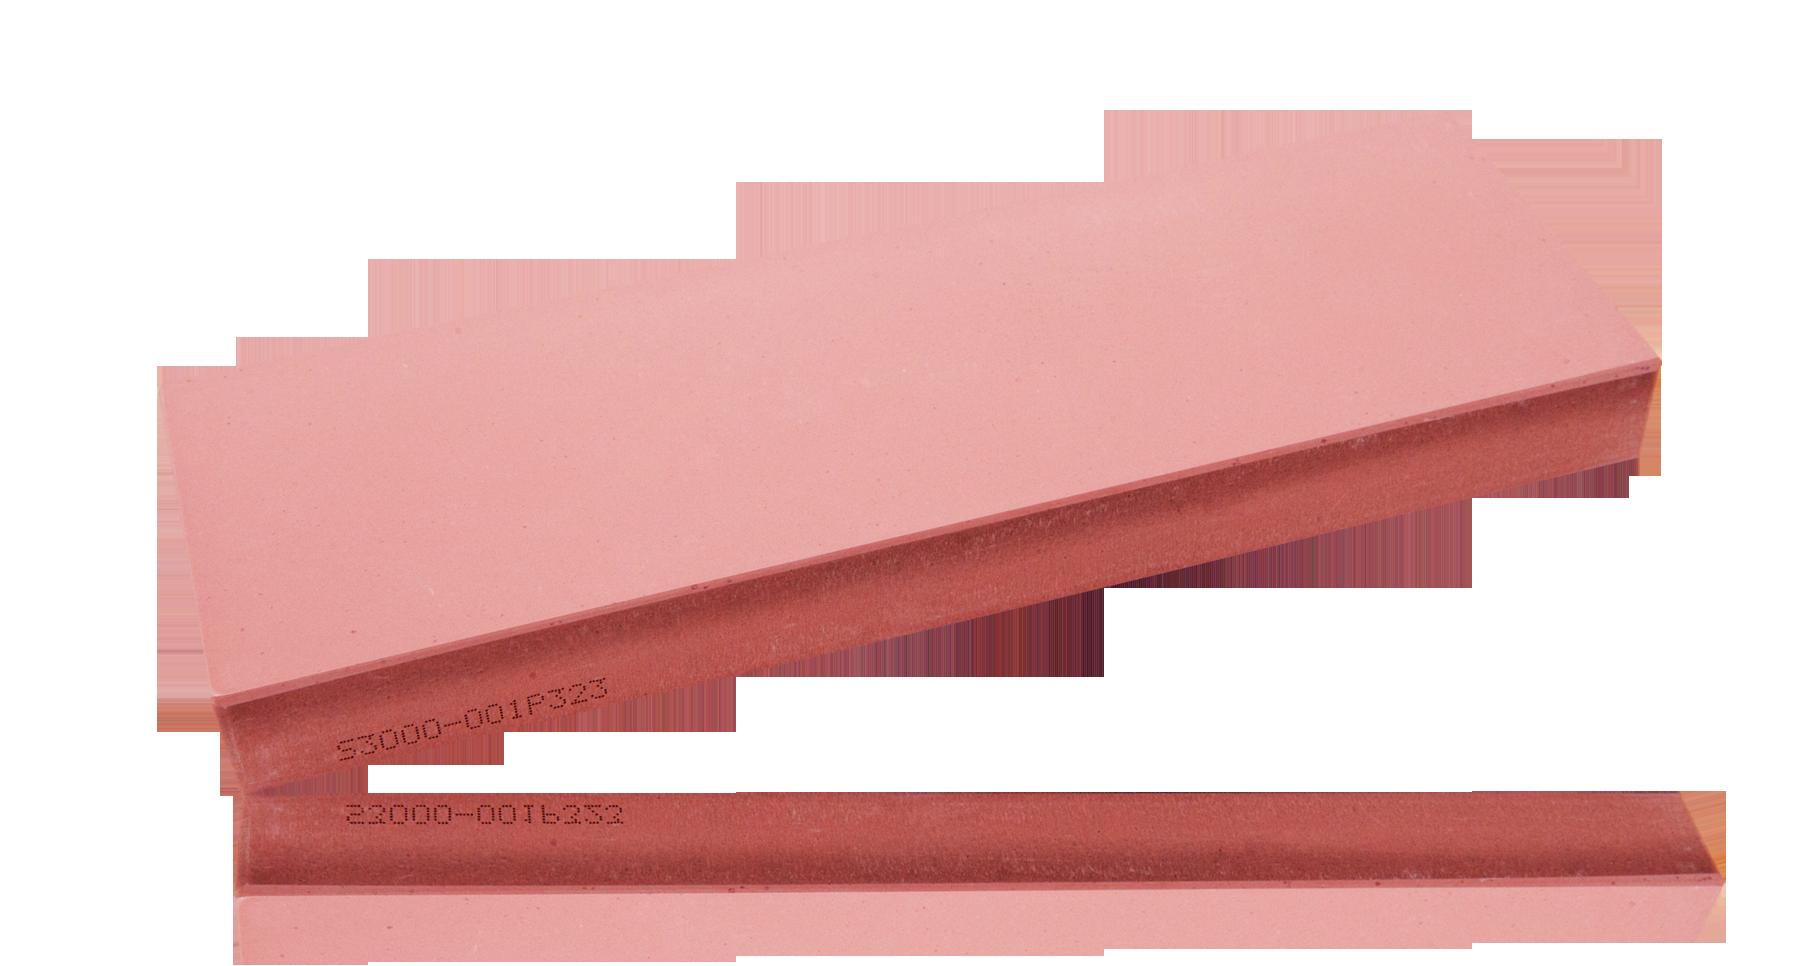 Камень точильный Naniwa S-430